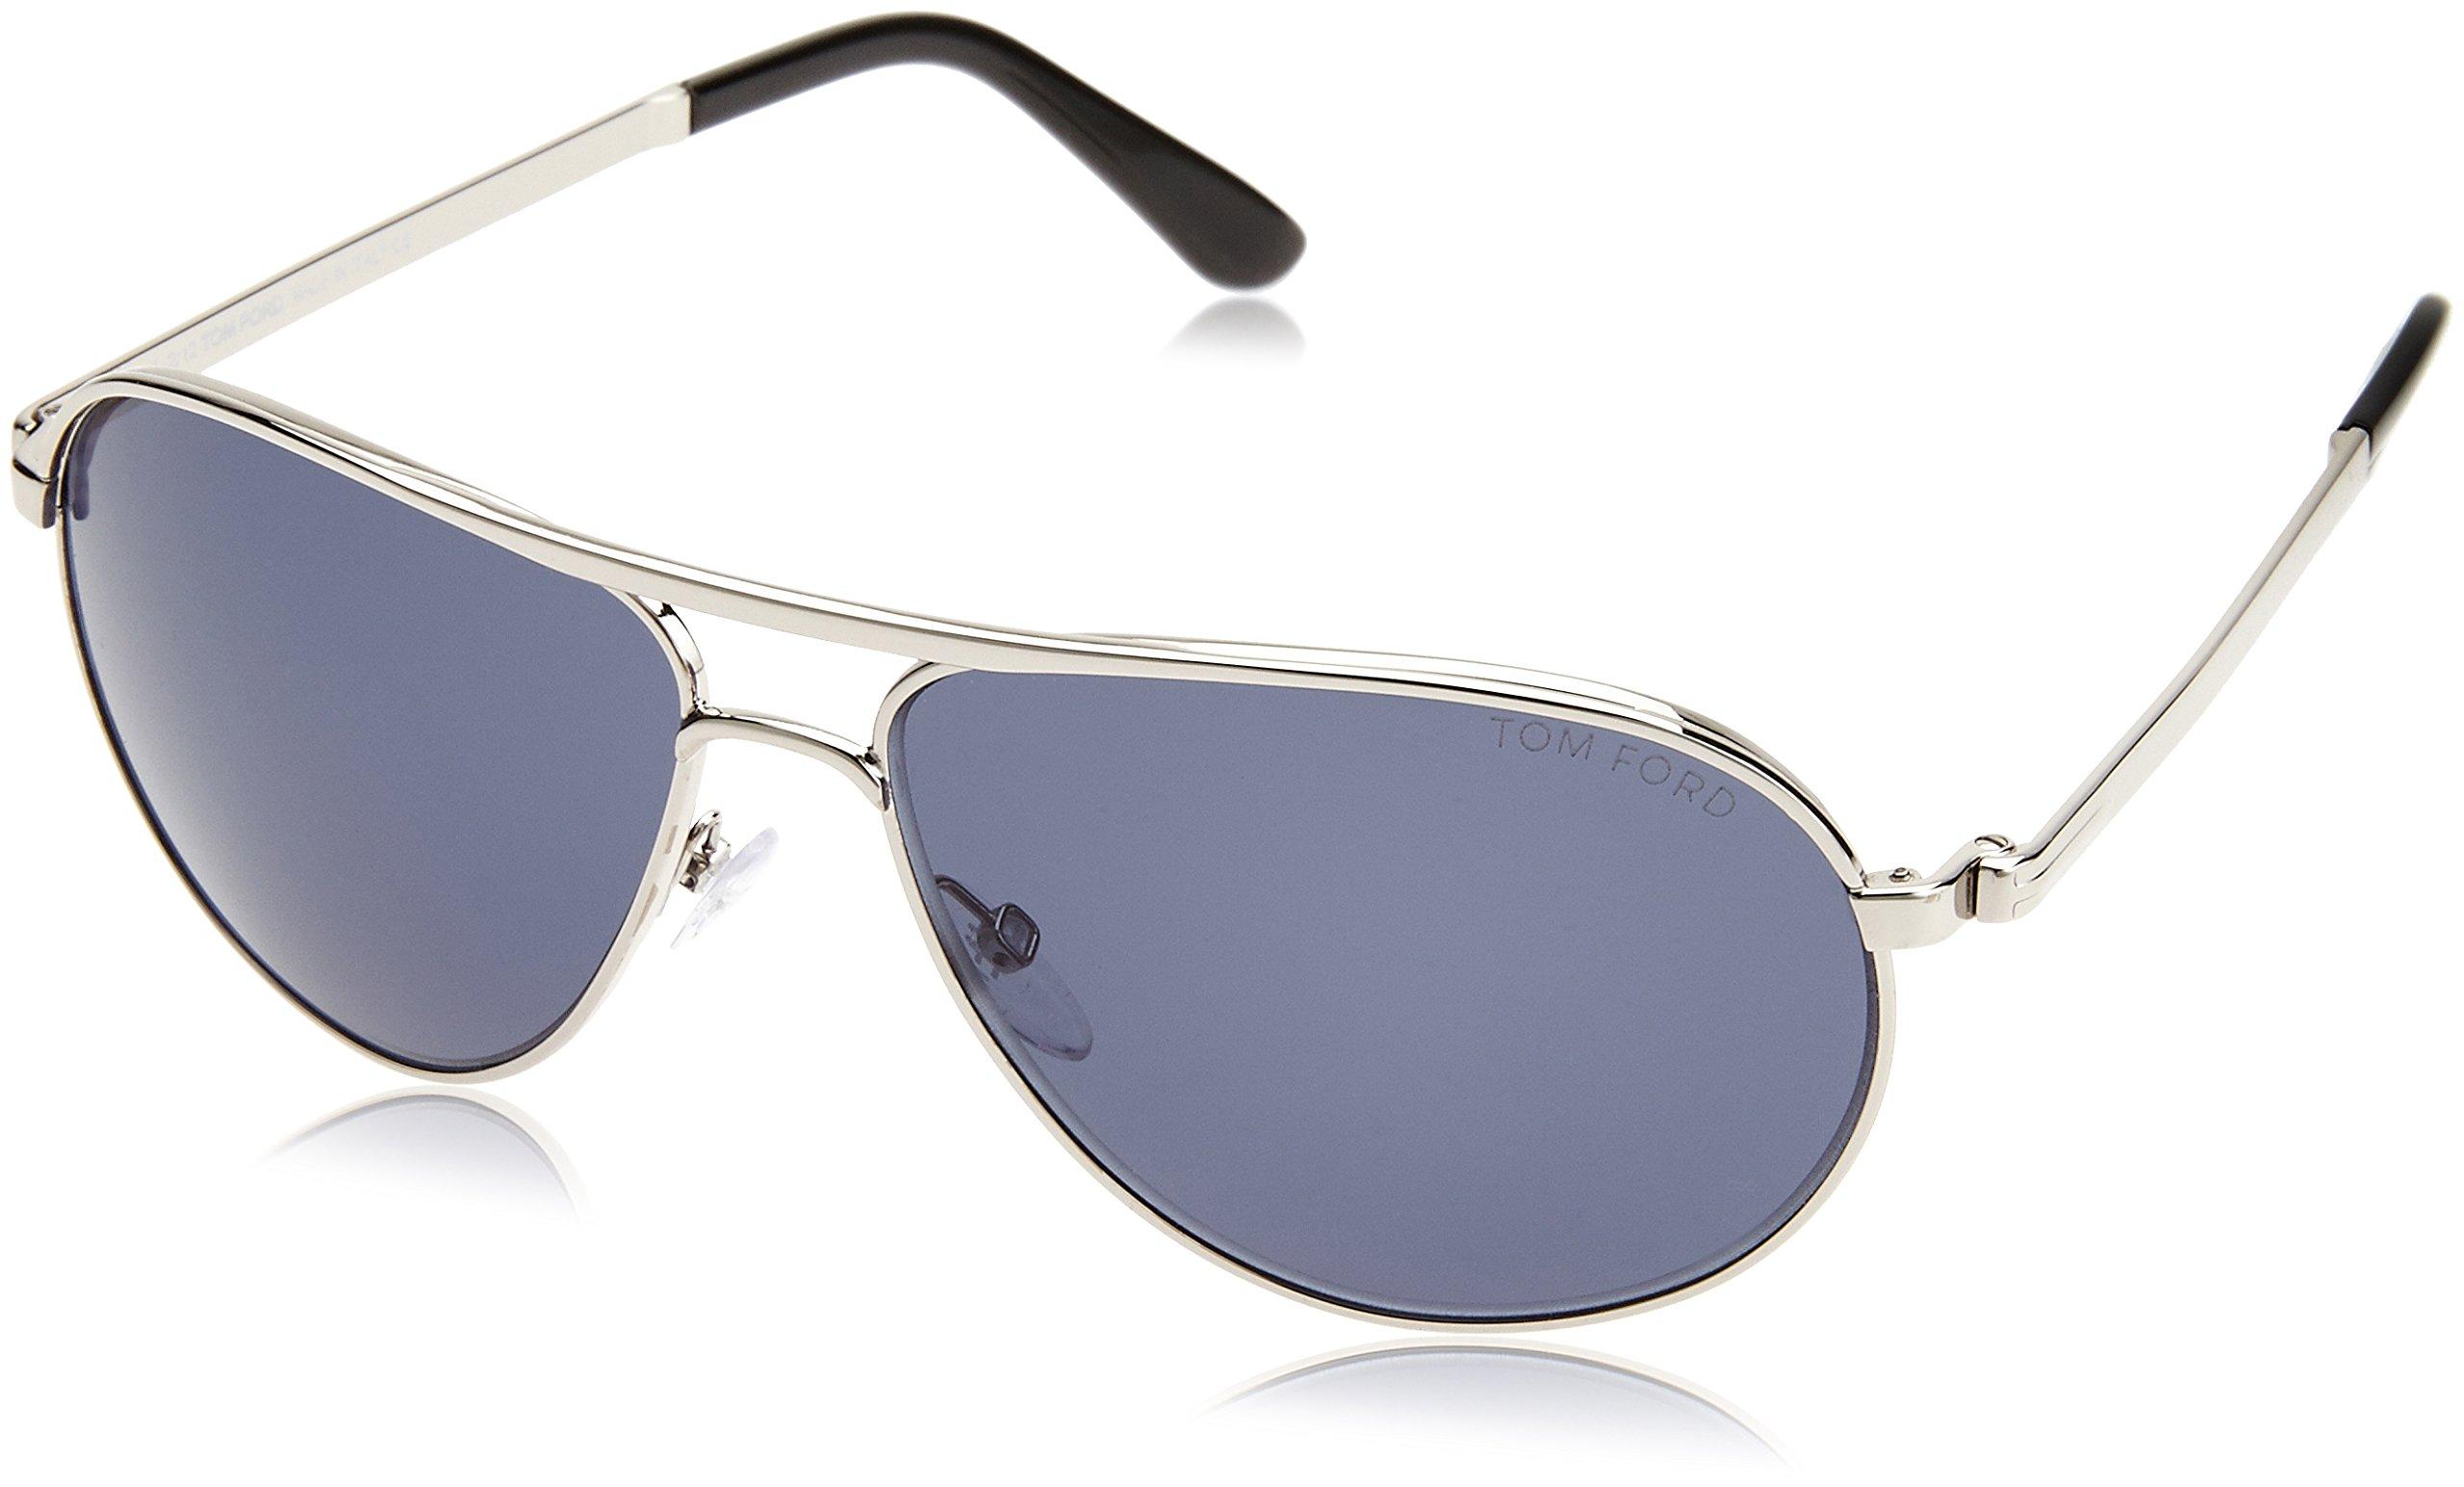 Tom Ford Sunglasses TF 144 SILVER 18V MARKO